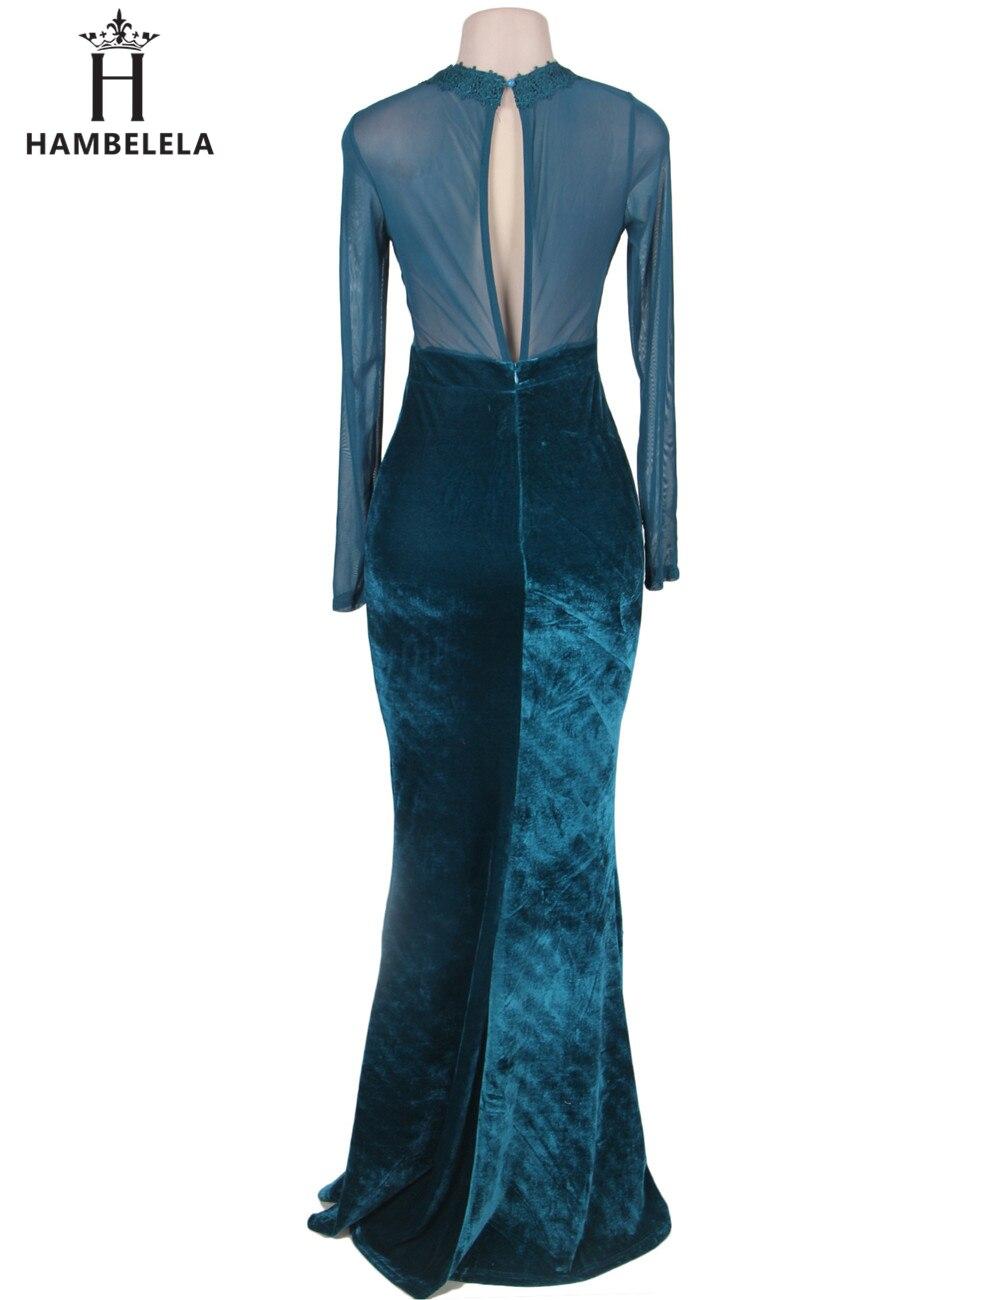 0313e3af52568b Hambele winter maxi dress 2017 vrouwen sexy lace dress o hals lange mouw  elegante avondfeest lange dress gown robe longue Femme in Hambele winter  maxi dress ...